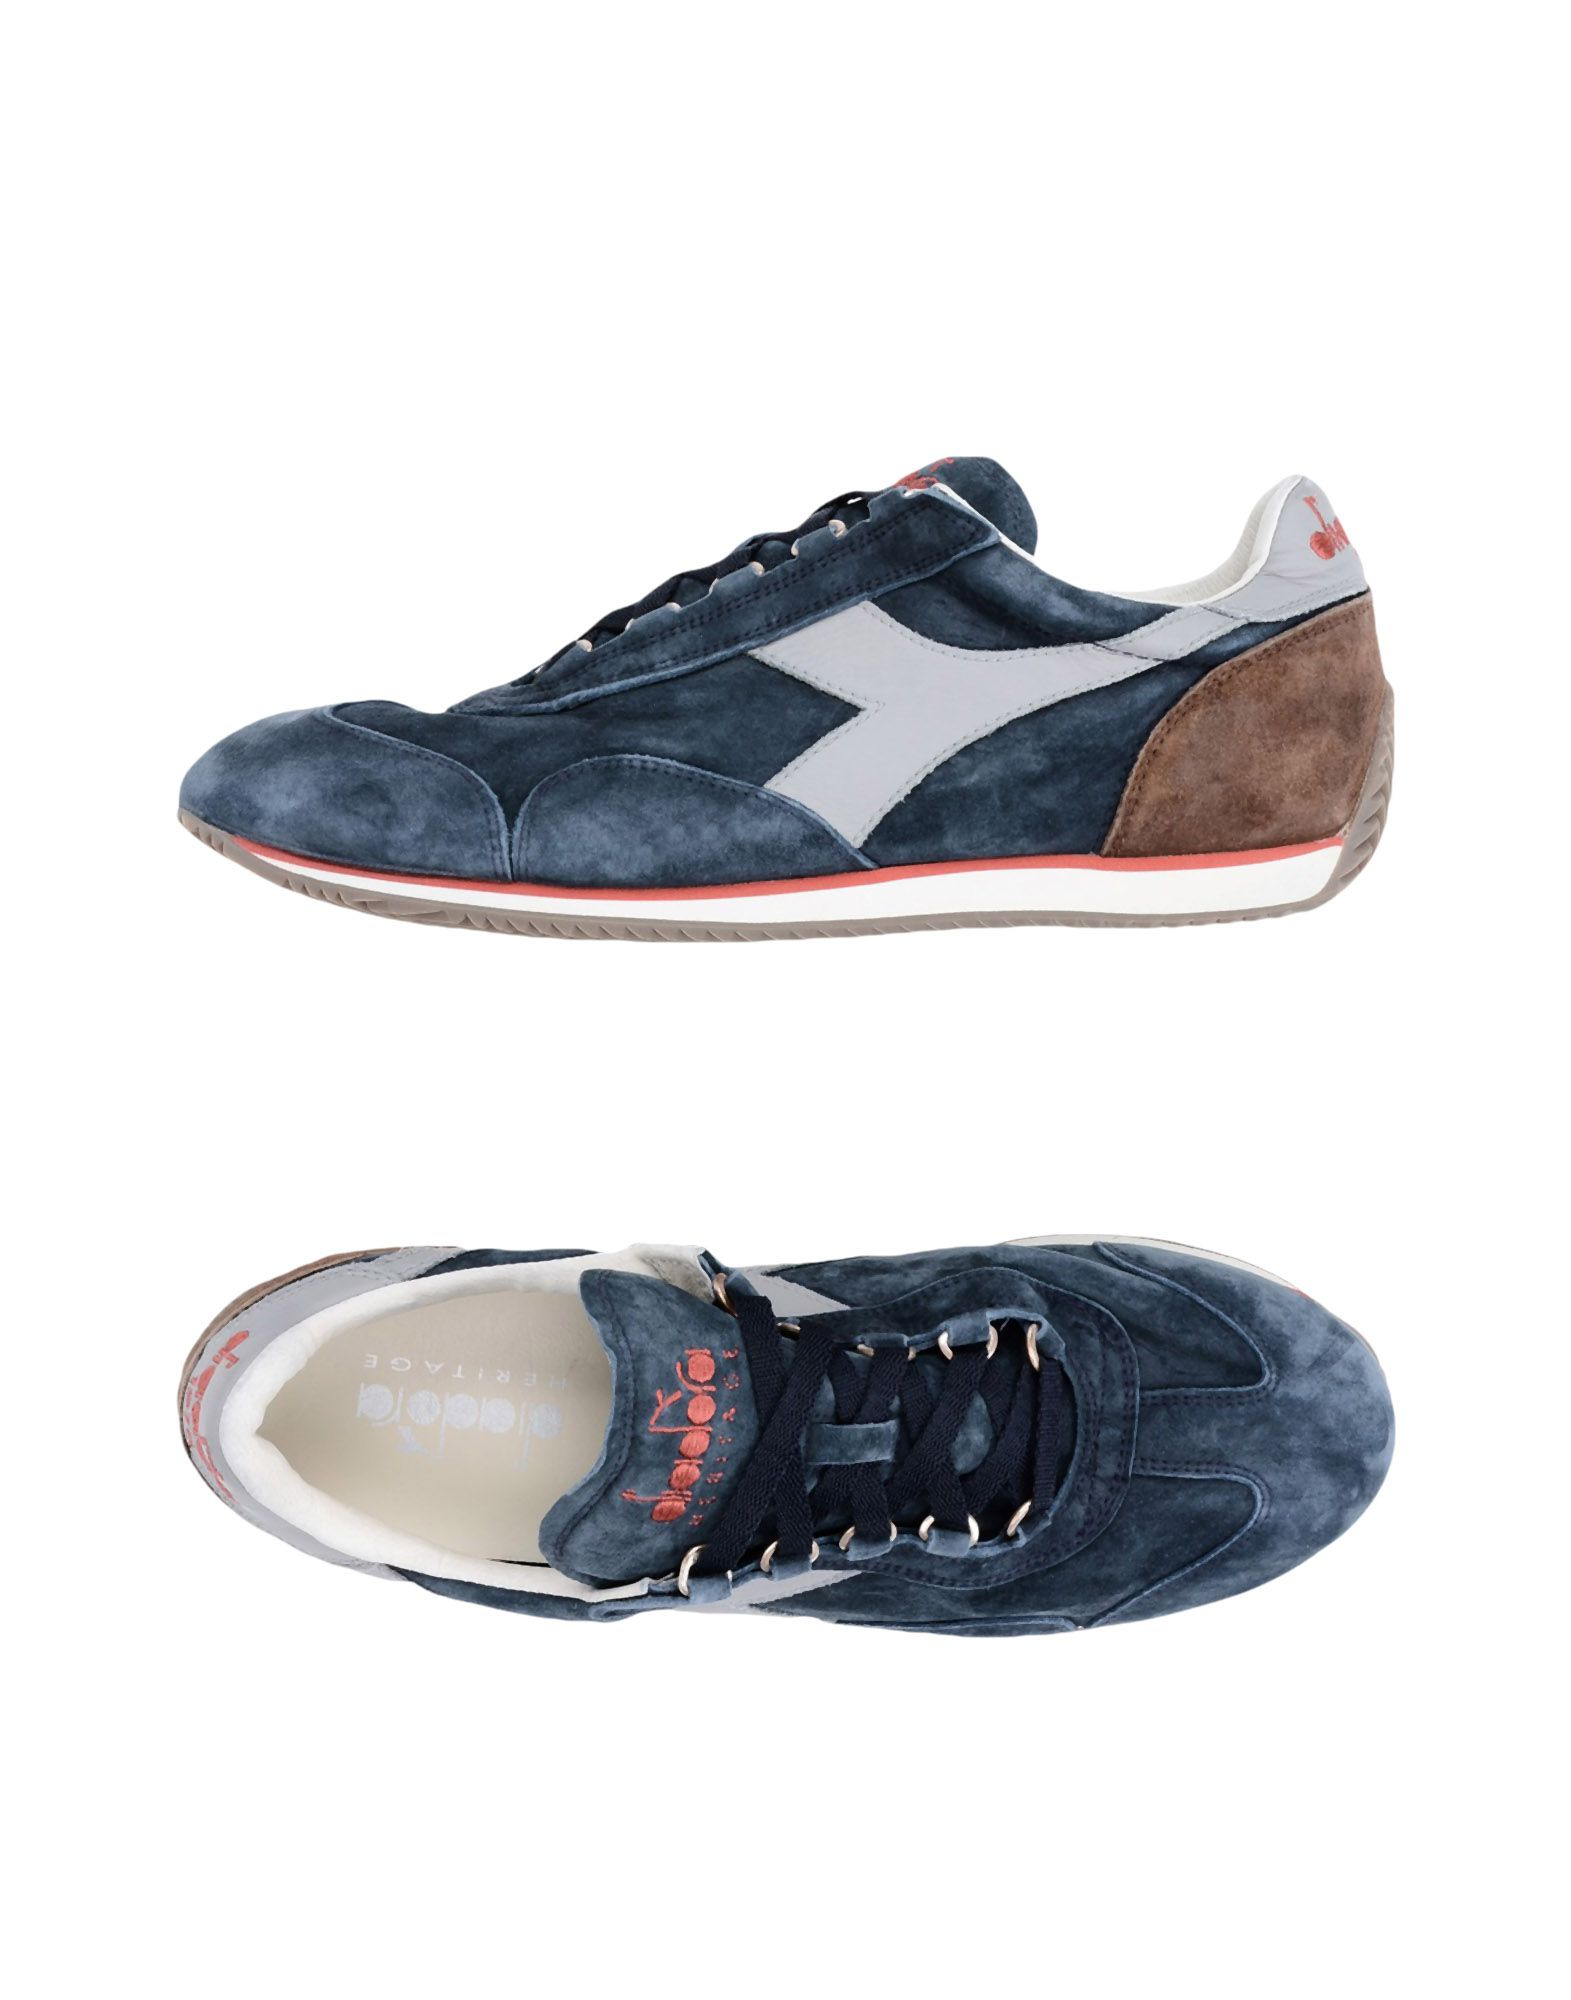 Sneakers Diadora Heritage Equipe S. Sw - Uomo - Acquista online su